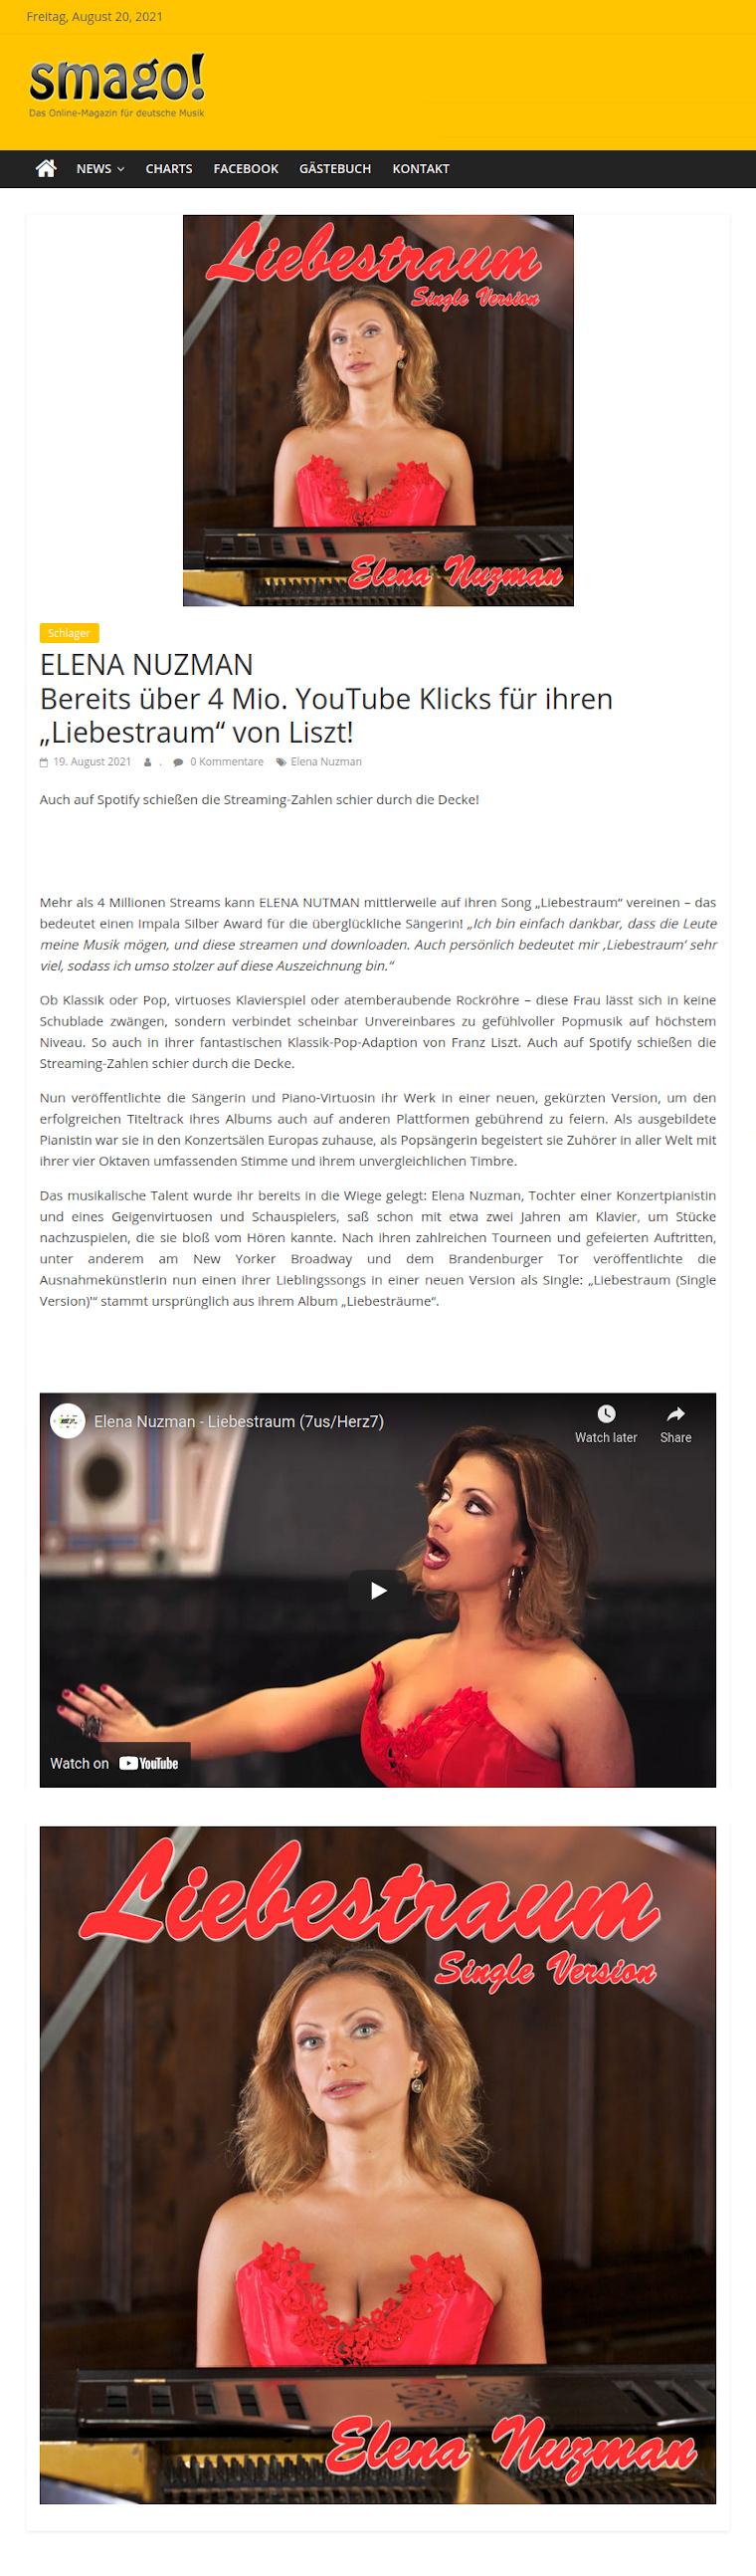 Elena Nuzman - News - smago.de - August 2021